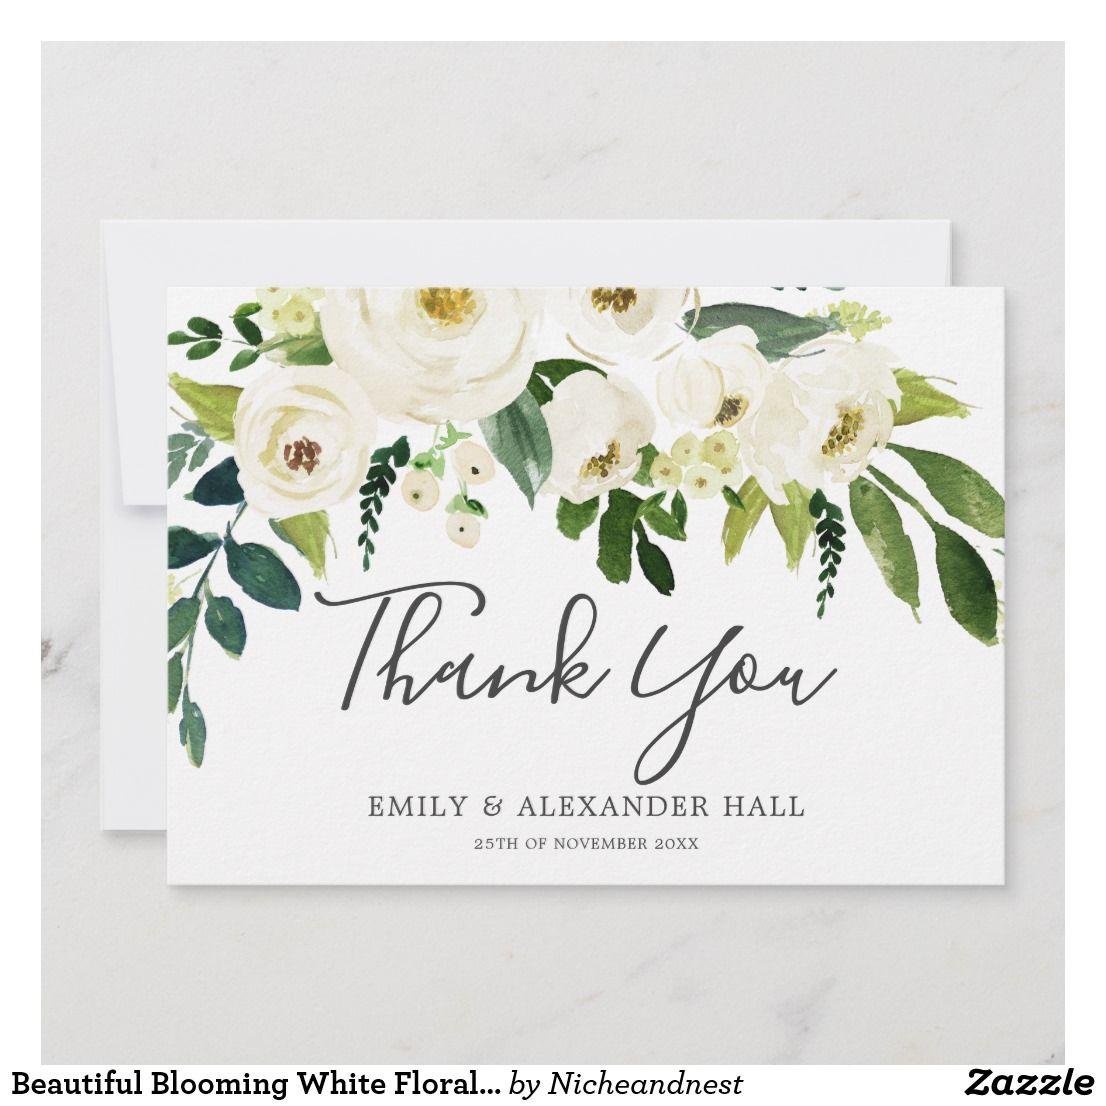 beautiful blooming white floral elegant wedding thank you